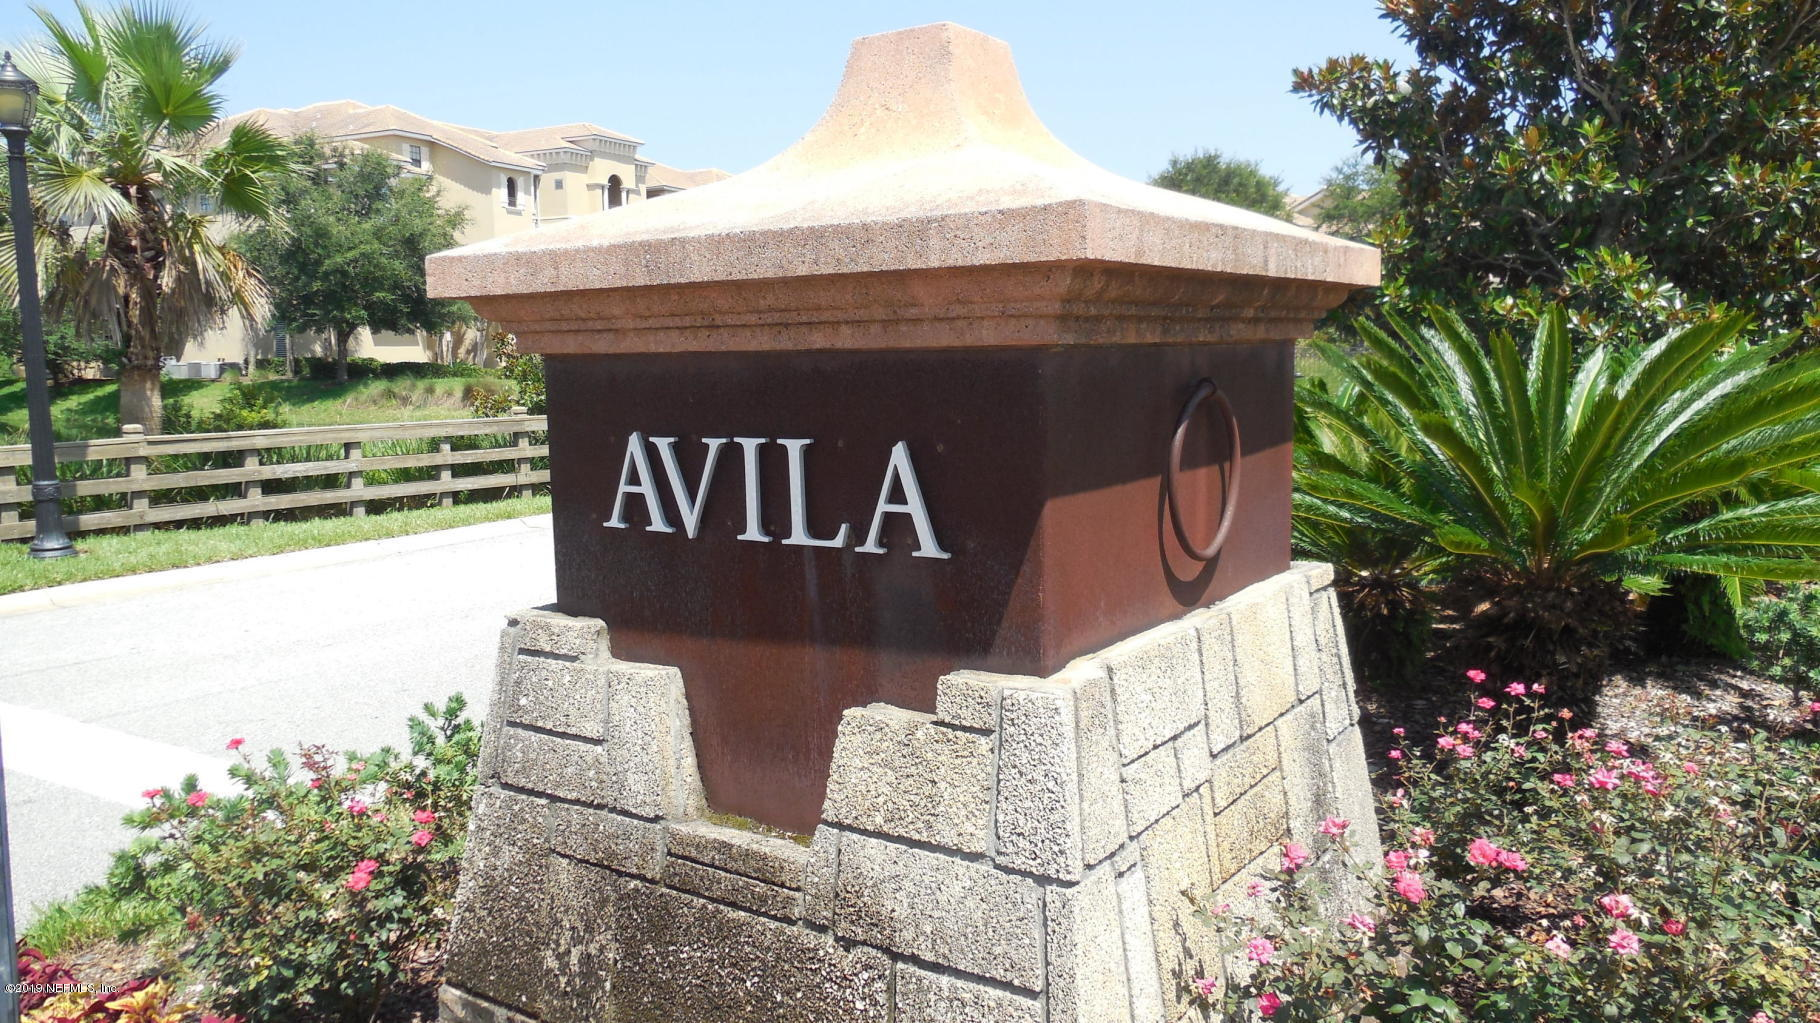 110 CALLE EL JARDIN, ST AUGUSTINE, FLORIDA 32095, 3 Bedrooms Bedrooms, ,2 BathroomsBathrooms,Rental,For Rent,CALLE EL JARDIN,1024467